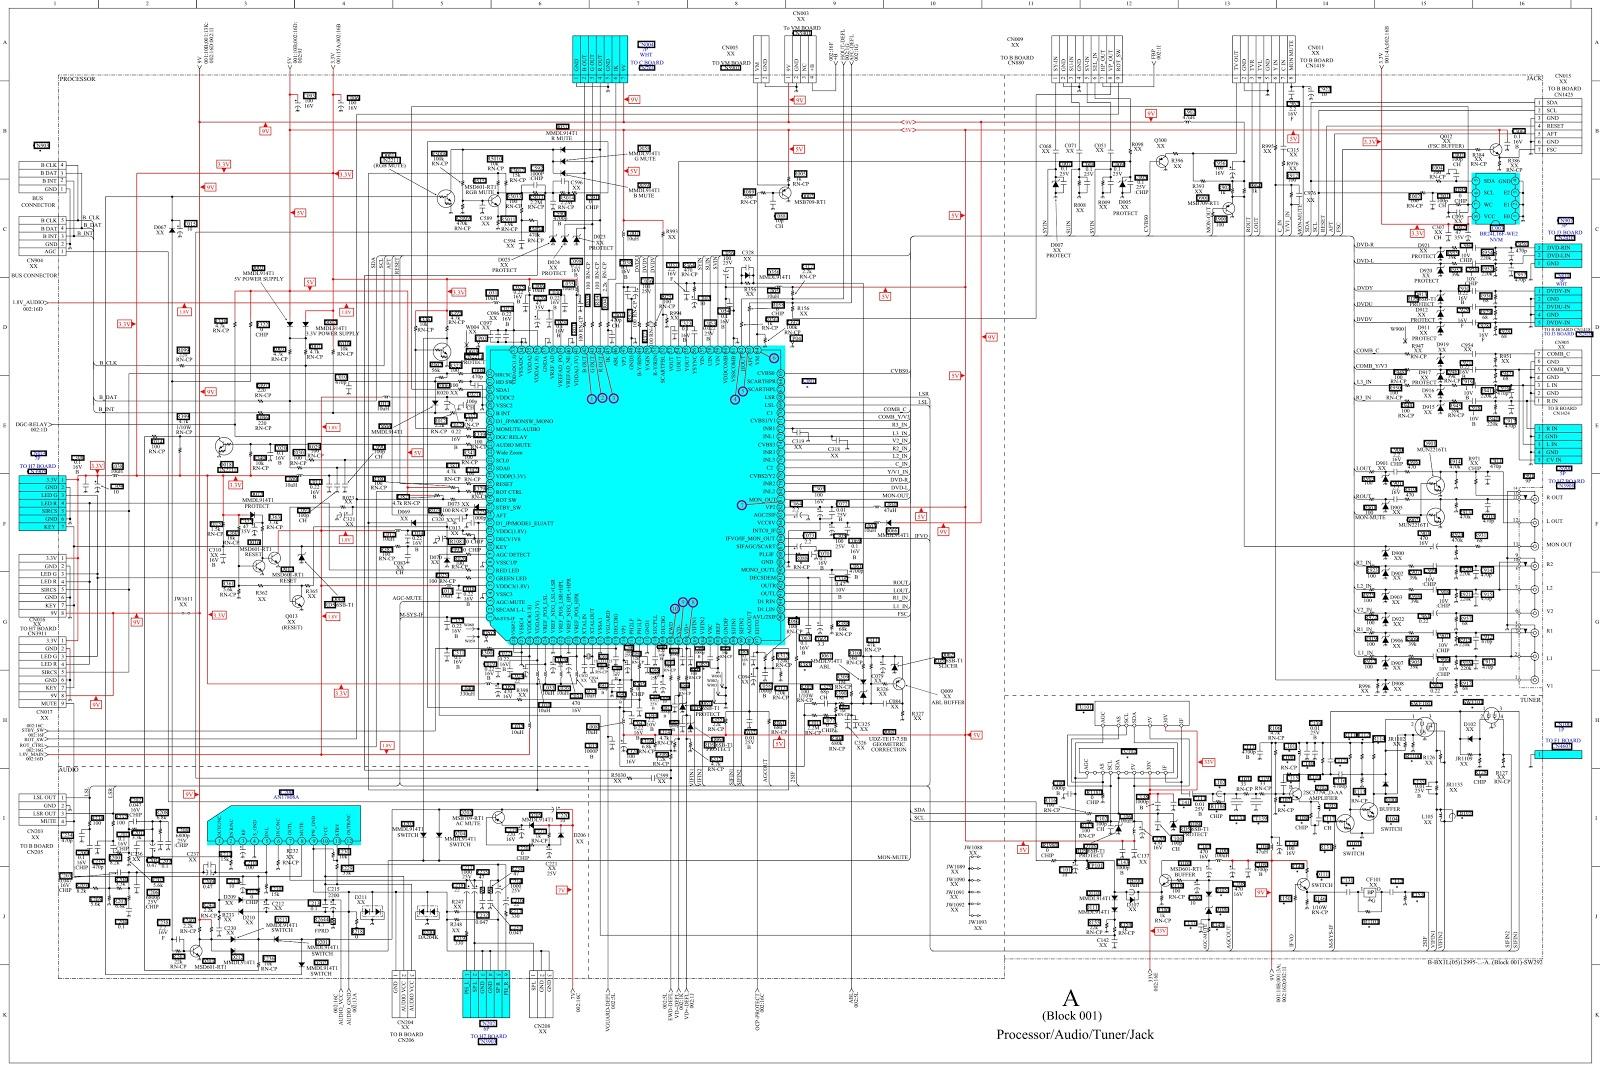 Sony KV SW292M – Trinitron TV – SMPS, Deflection and CRT